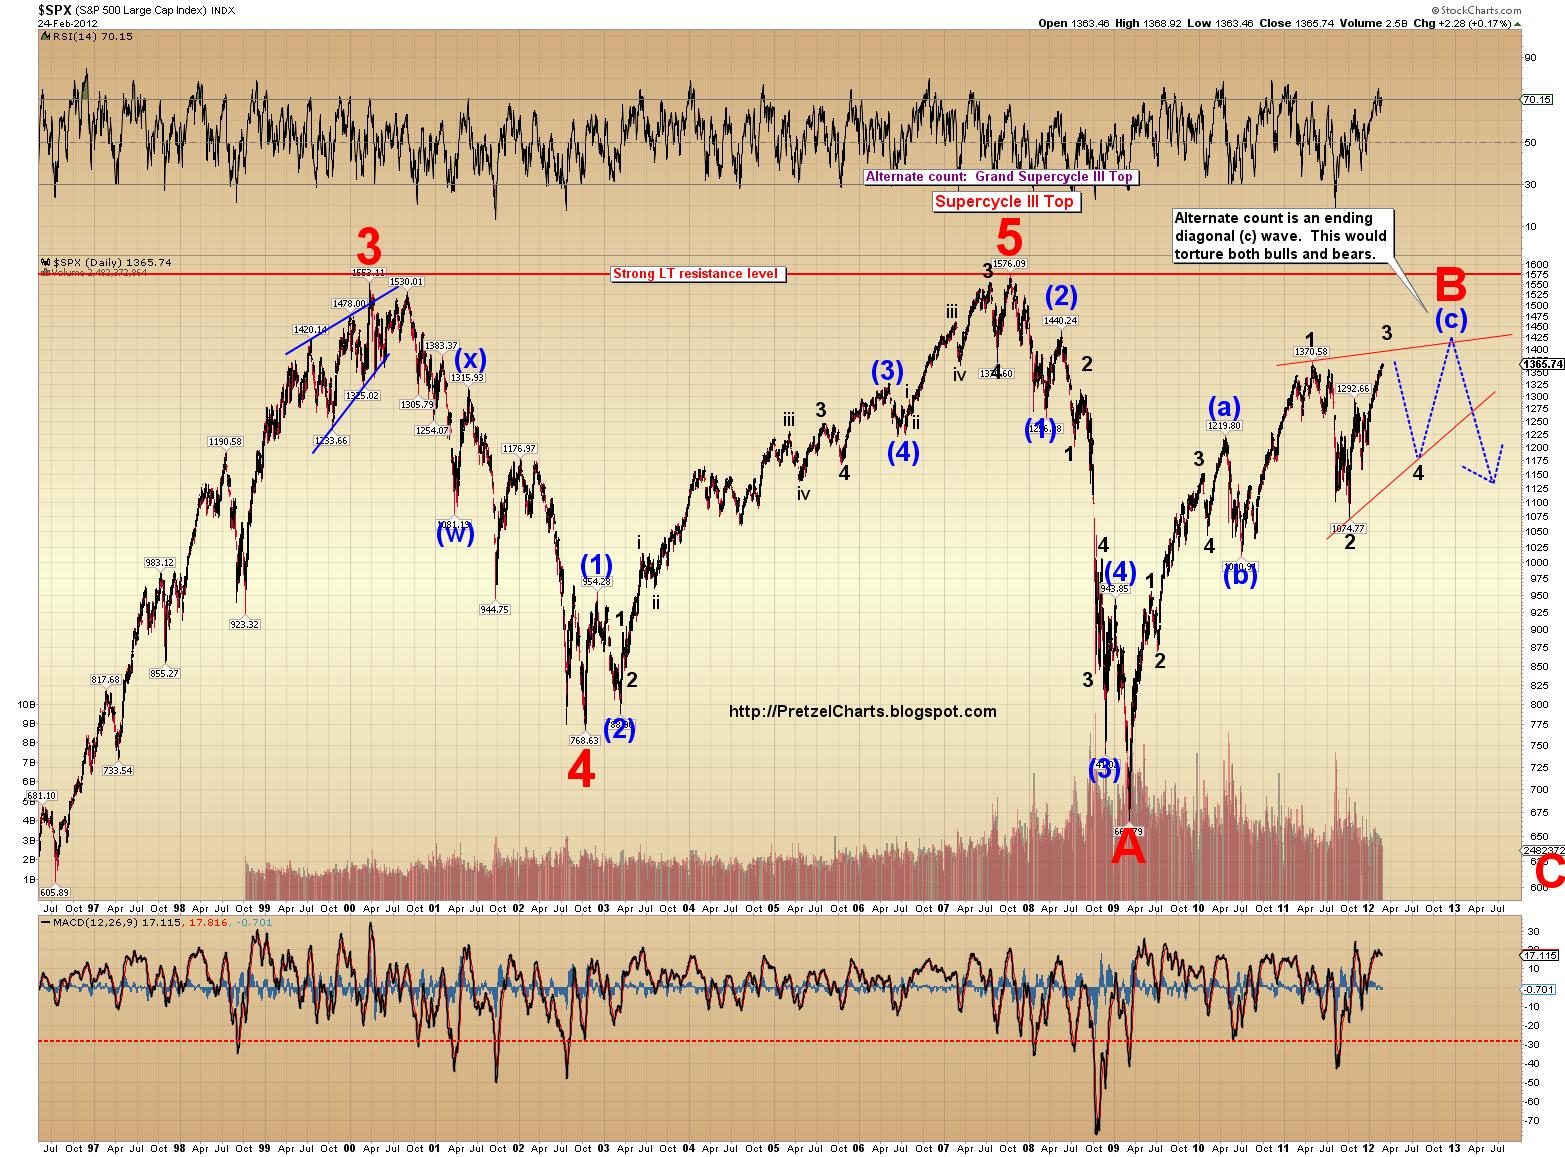 Pretzel Logic's Market Charts and Analysis: February 2012